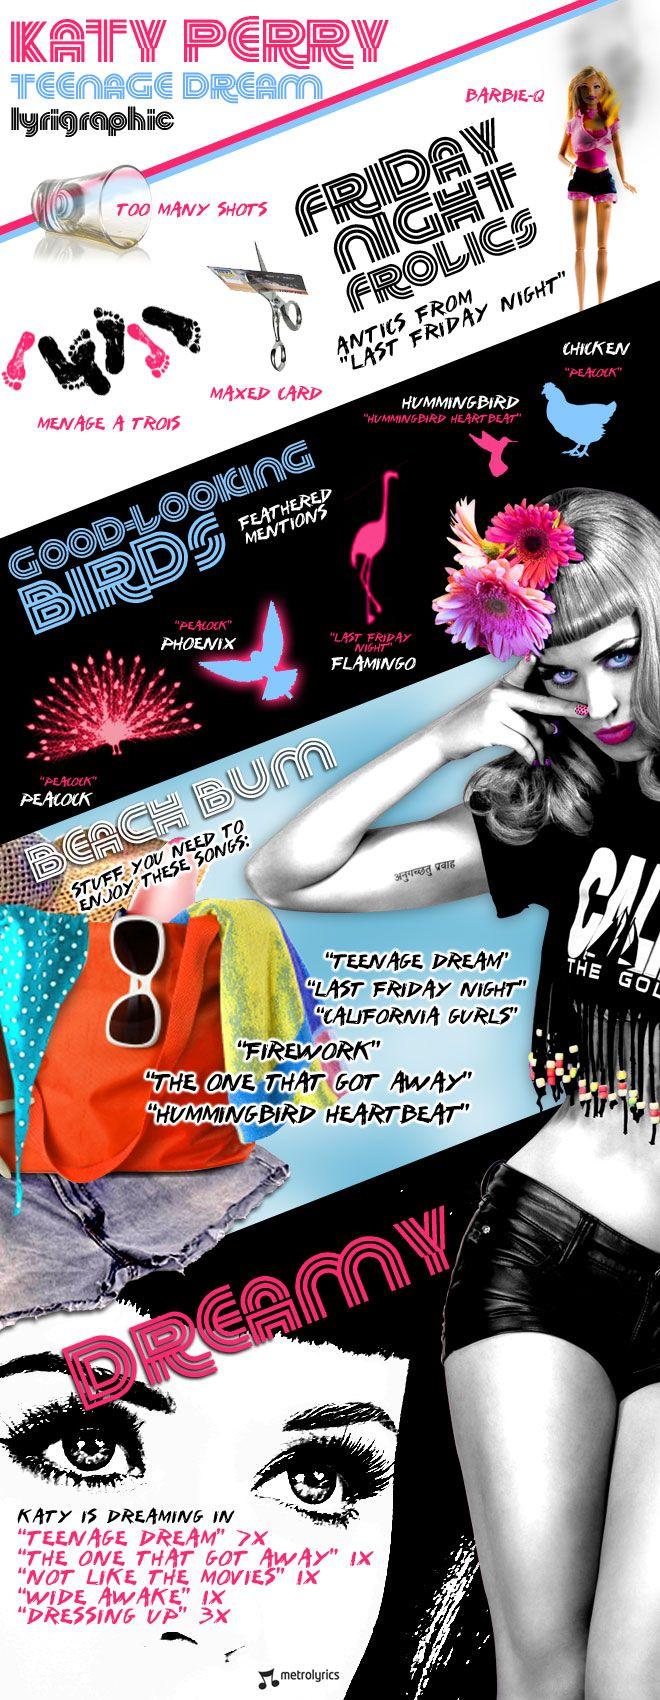 Plastic bag katy perry lyrics - Lyrigraphic Katy Perry Teenage Dream Lyrics From Metrolyrics Com